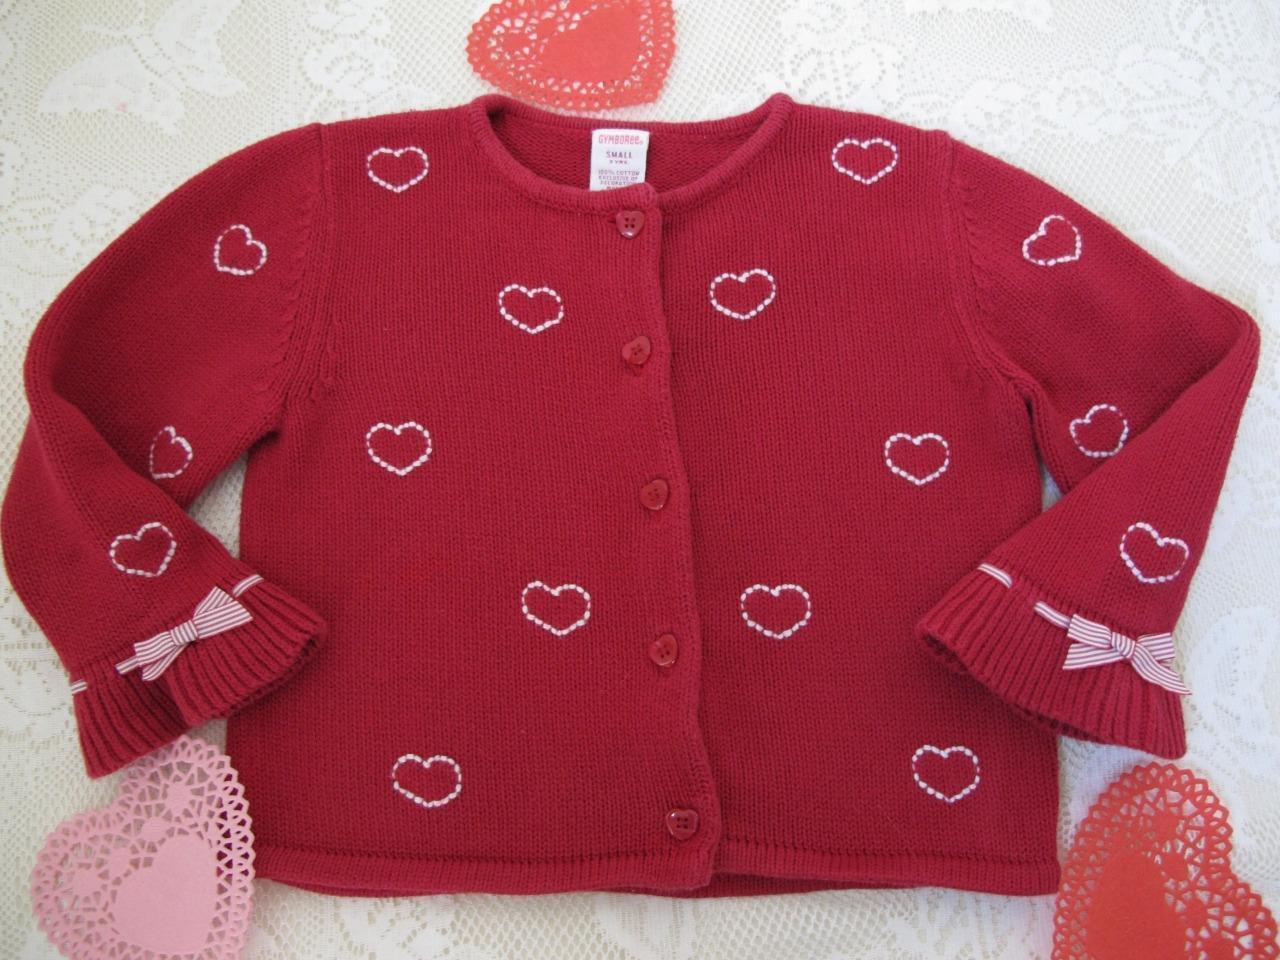 3febddf69b1 Gymboree Valentine Cardigan Sweater S 3 and 50 similar items. S l1600